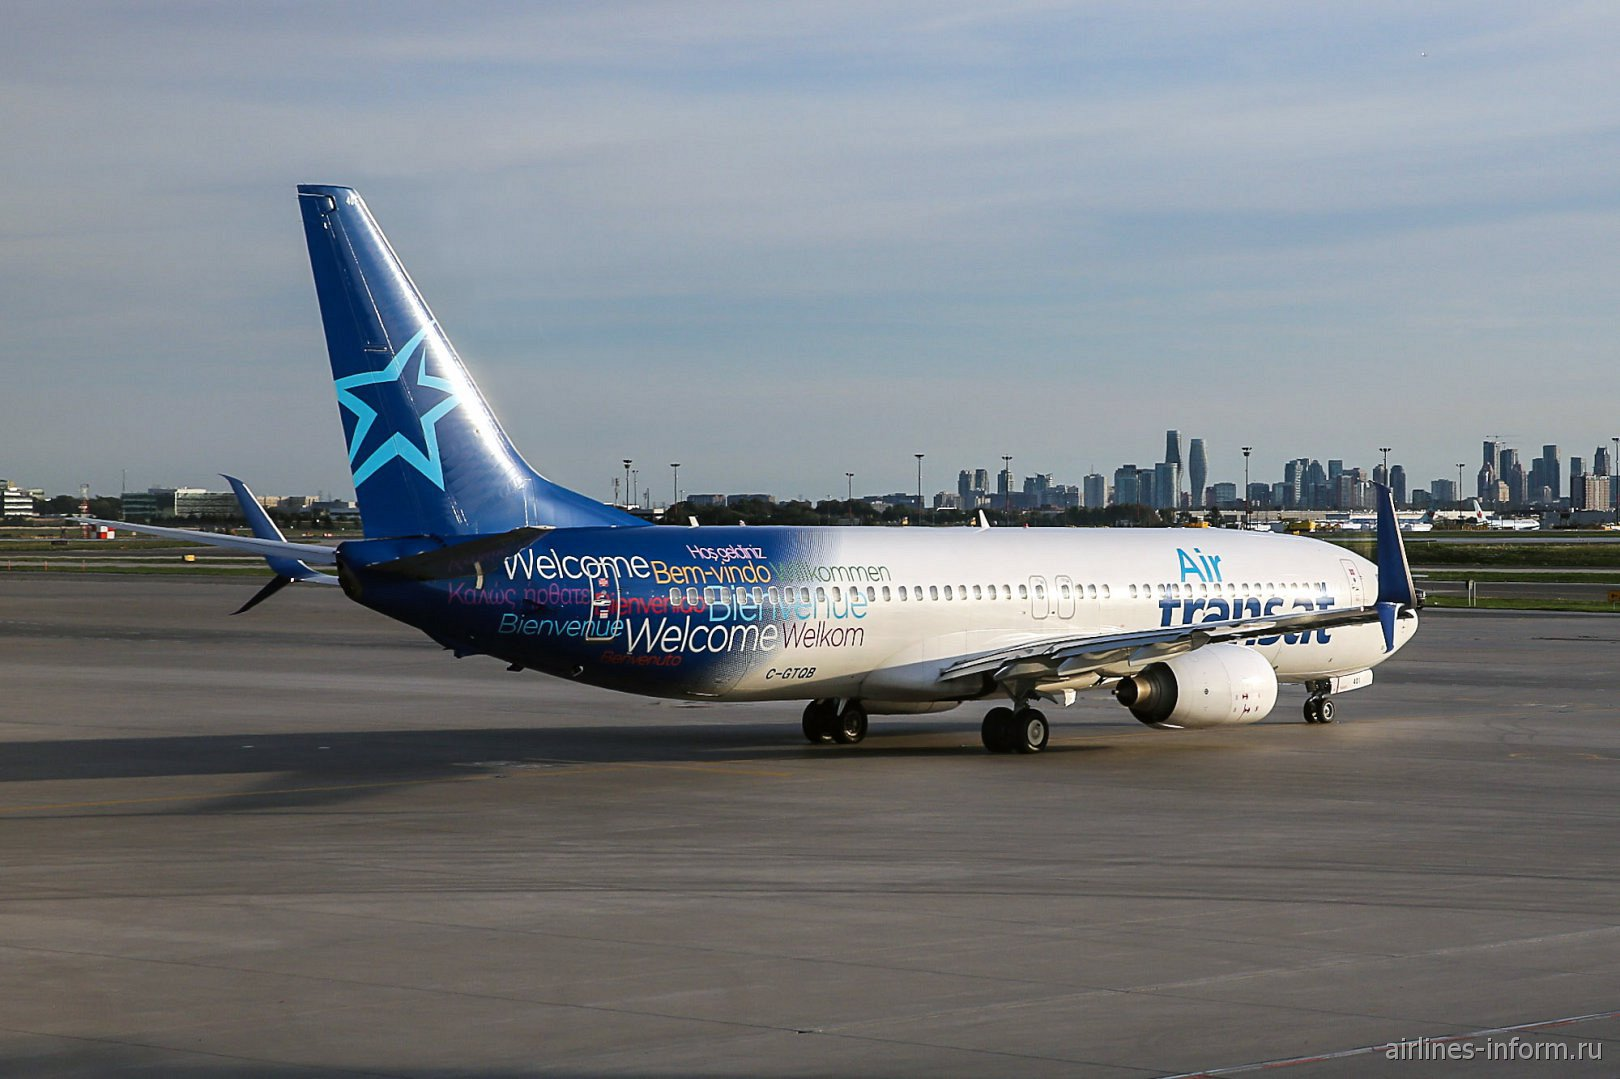 Боинг-737-800 авиакомпании Air Transat в аэропорту Торонто Пирсон